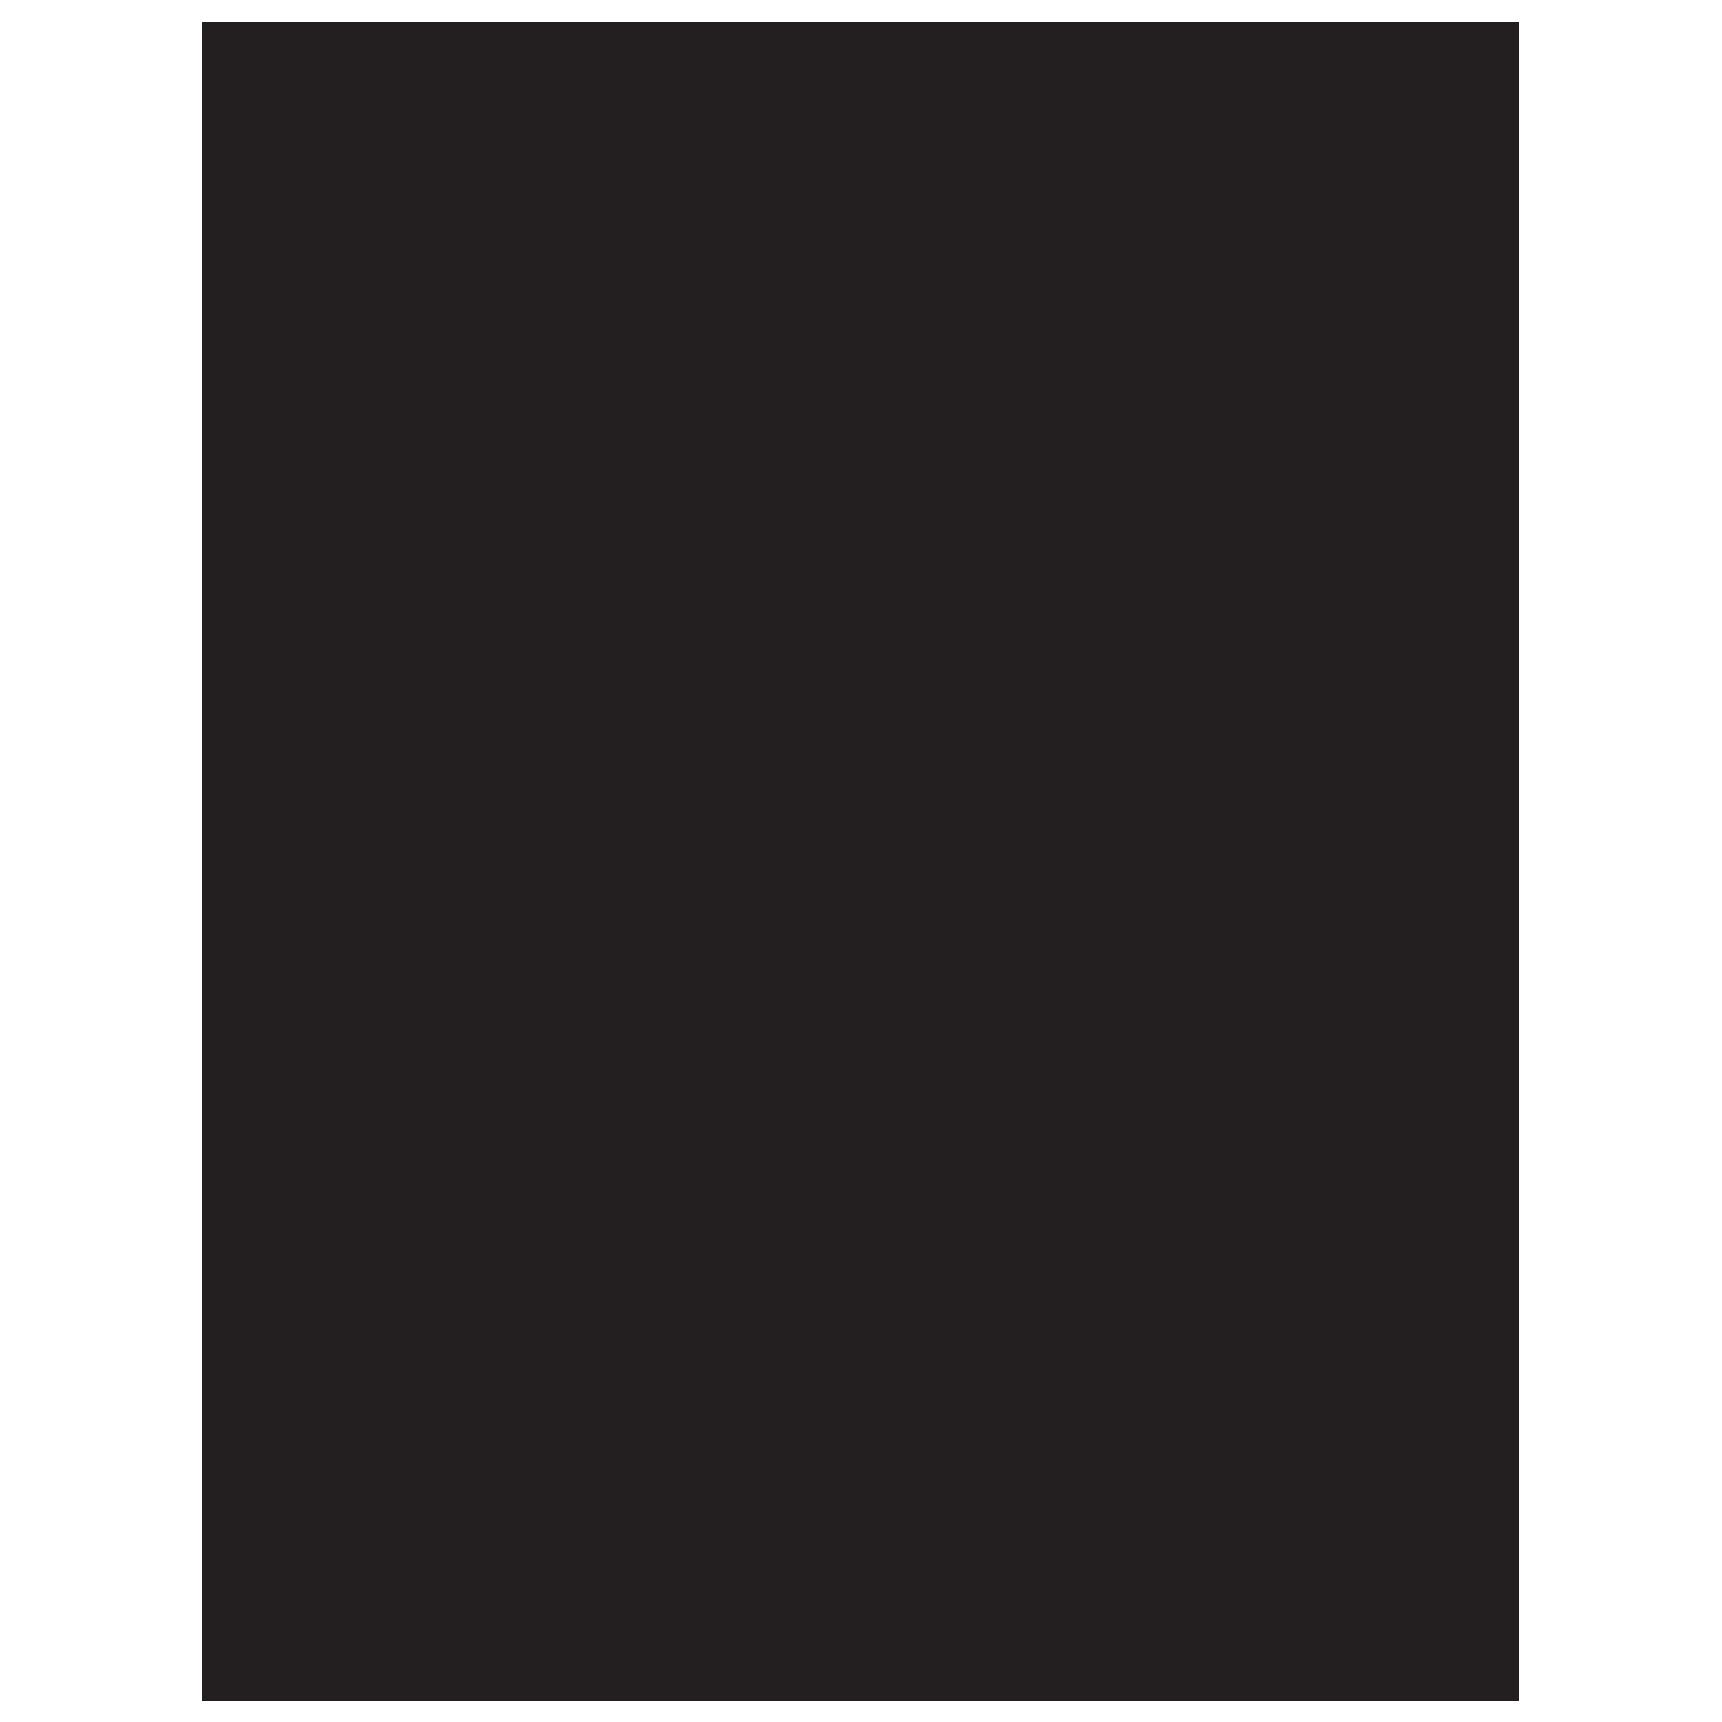 Union House Arts